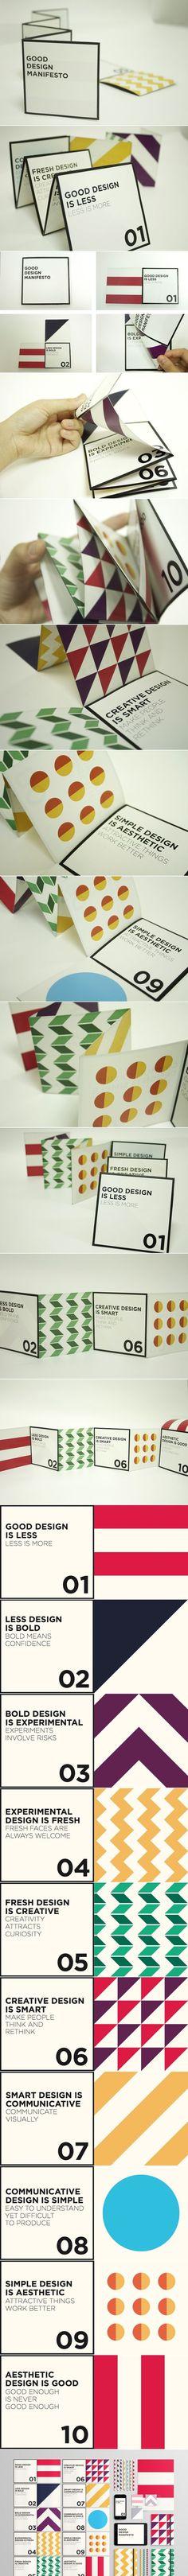 70 Ideas For Design Studio Flyer Creative Layout Design, Graphisches Design, Print Layout, Flyer Design, Branding Design, Nail Design, Print Design, Cv Inspiration, Illustration Inspiration